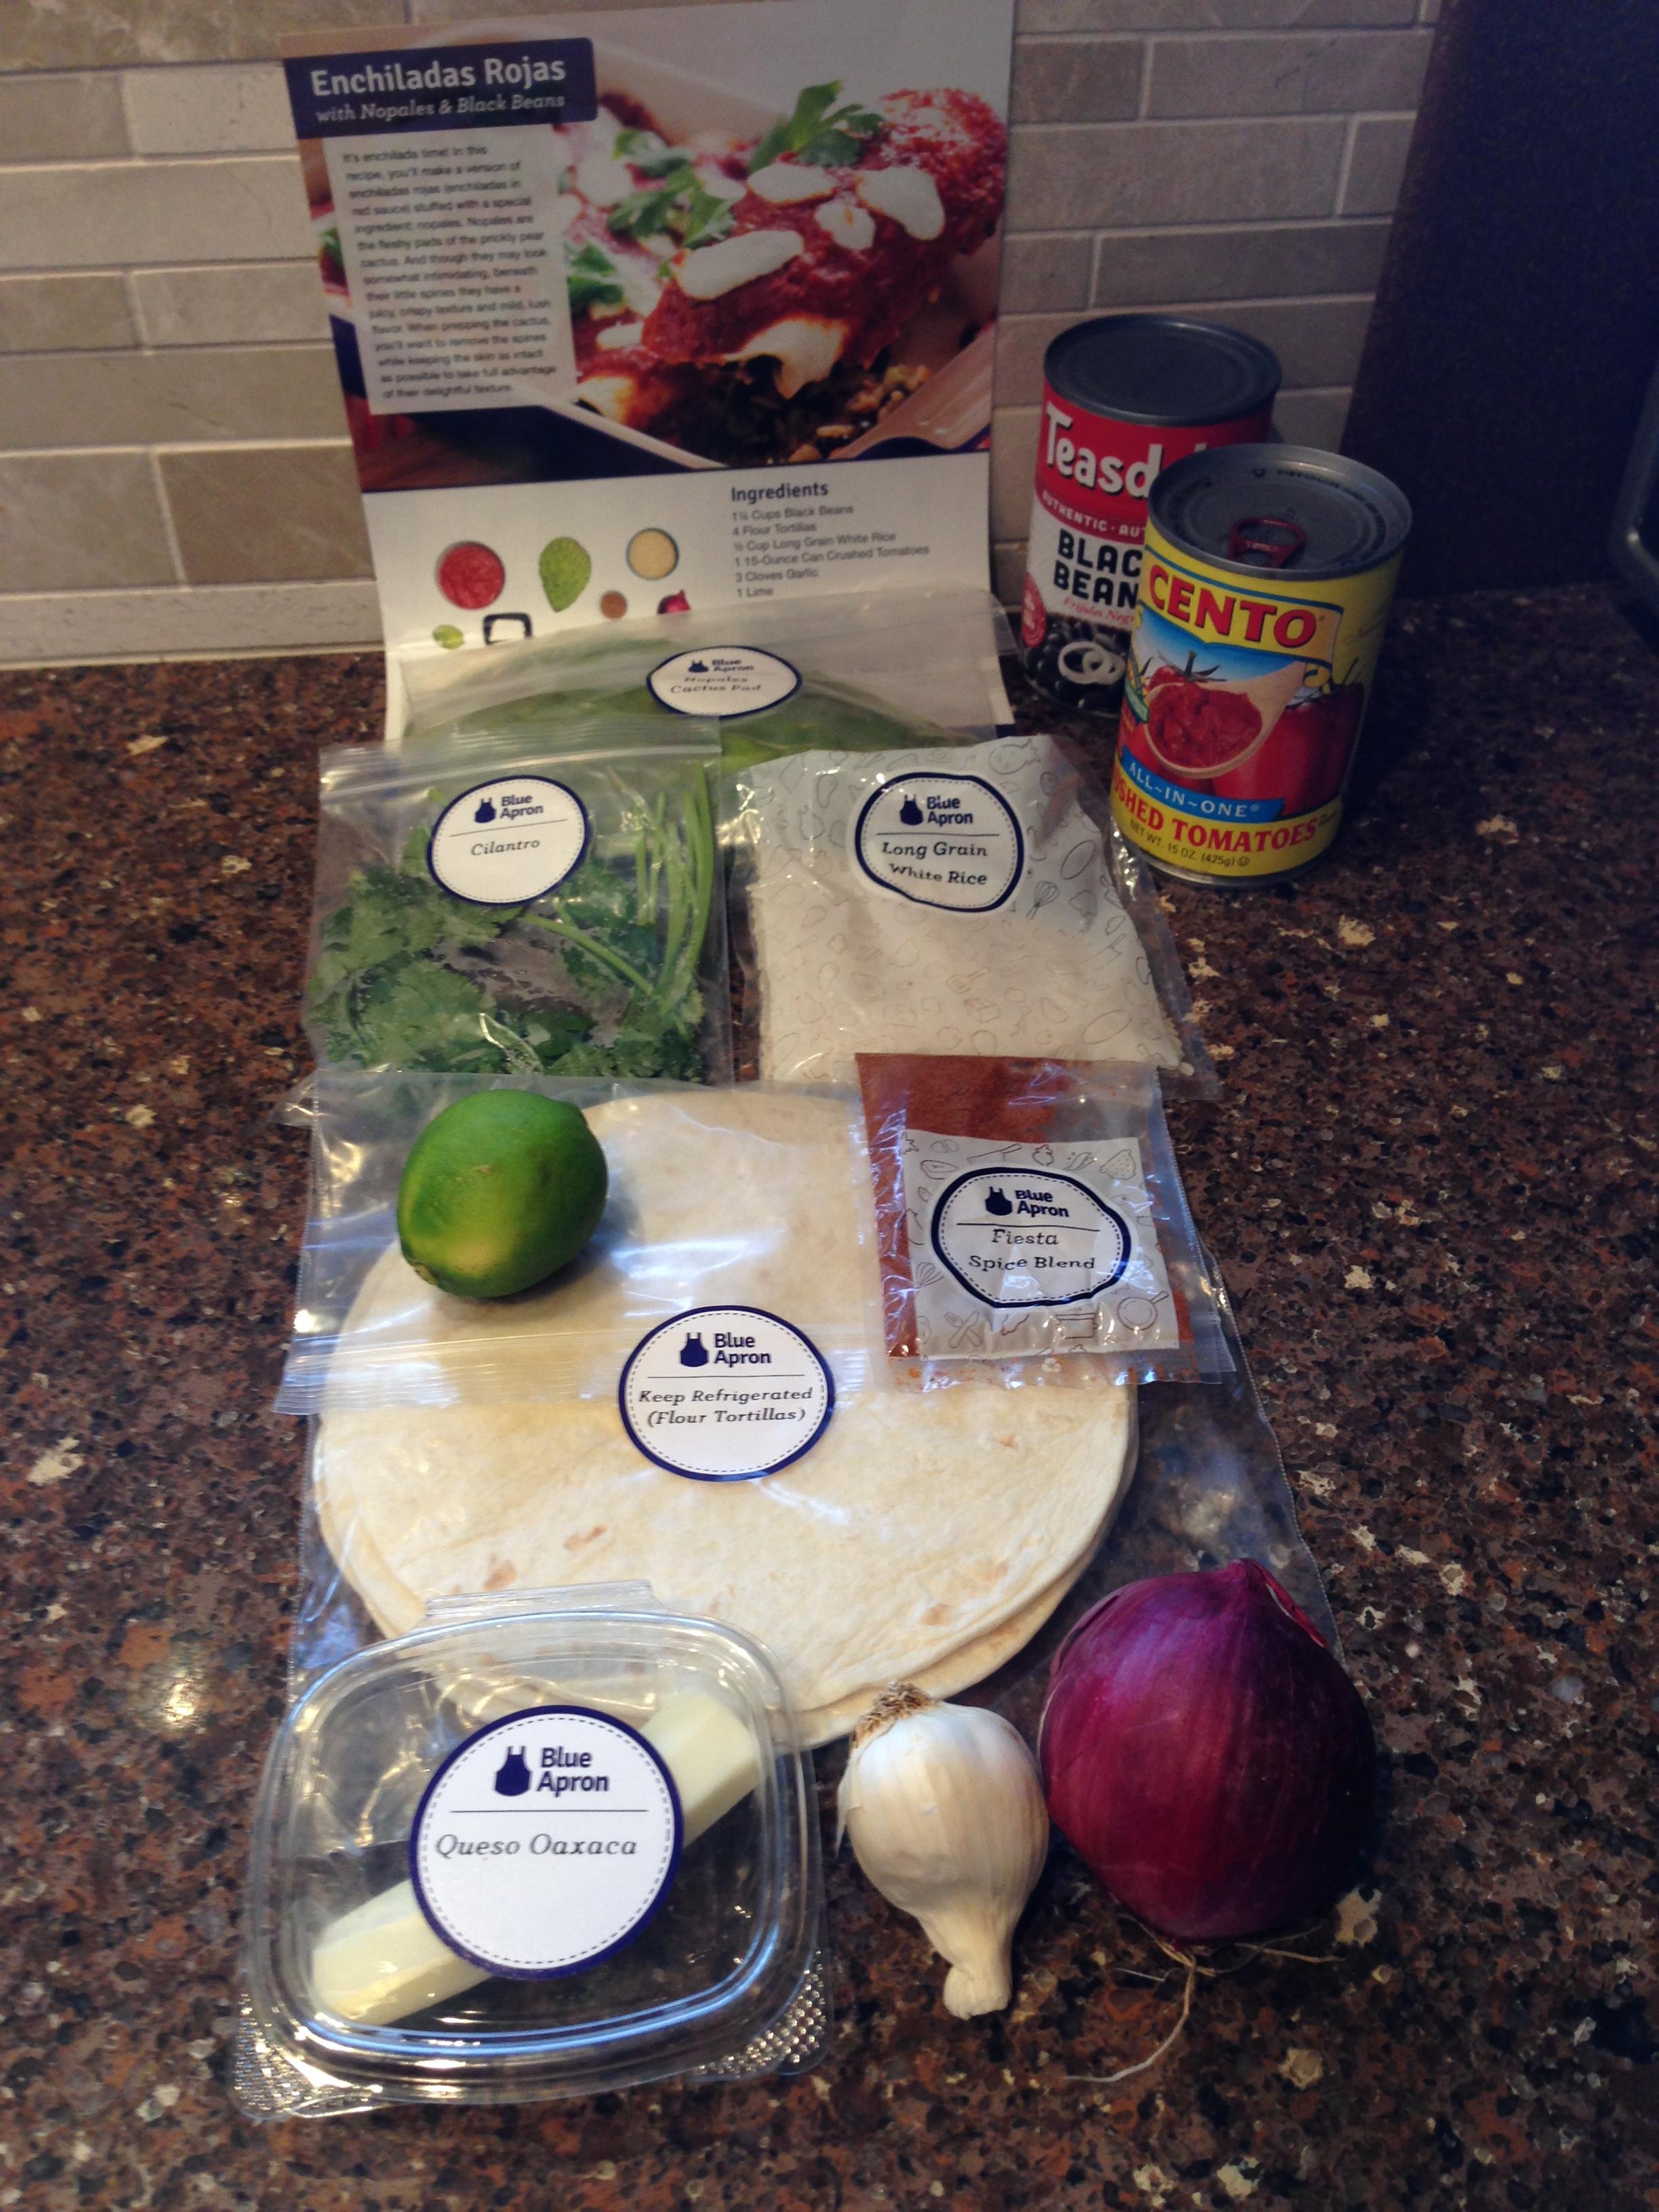 Blue apron zucchini enchilada - 2015 05 10 Enchiladas Rojas1